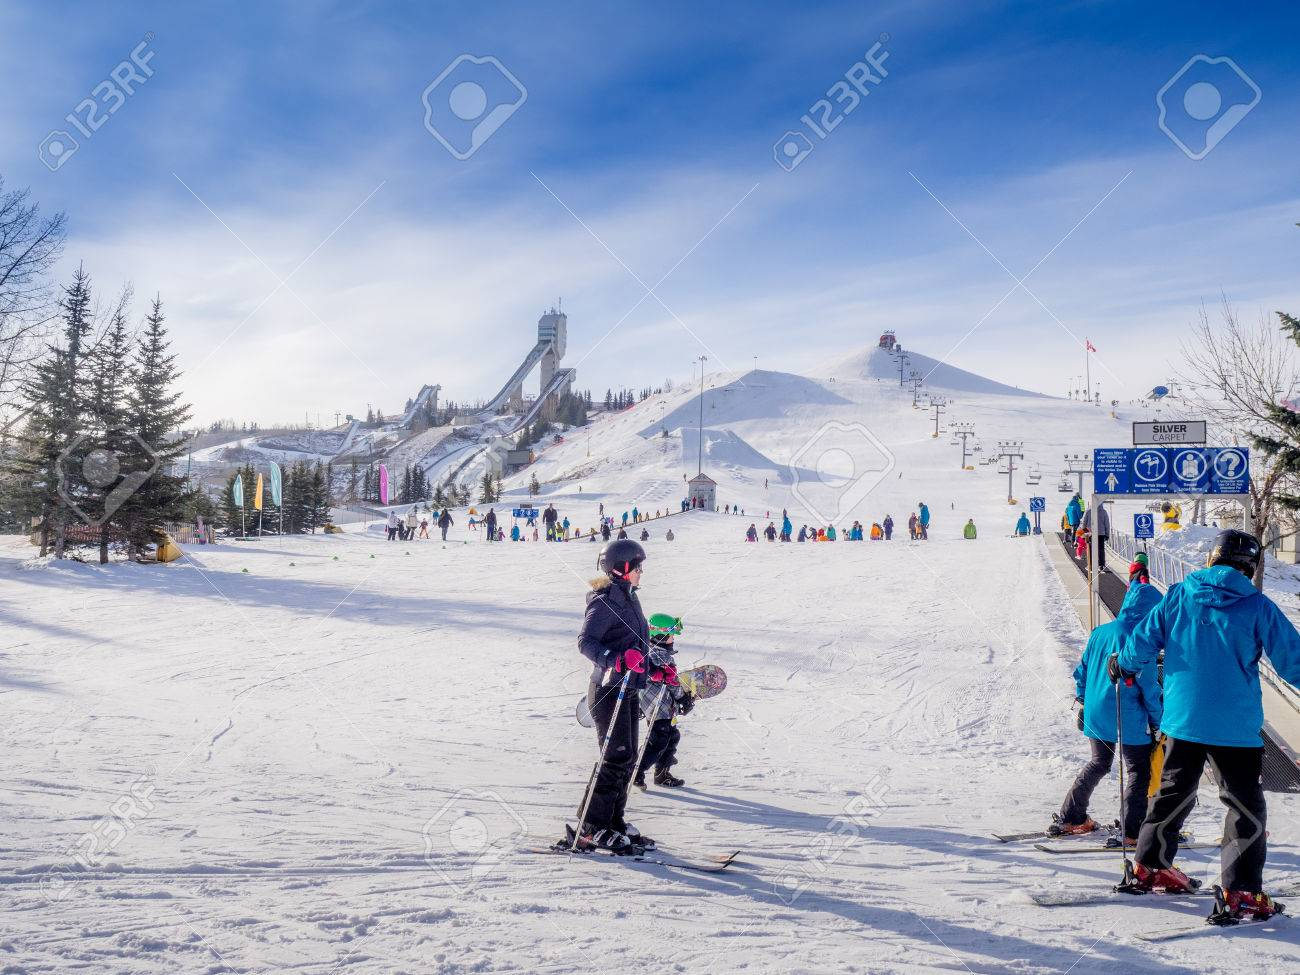 skiing at canada olympic park in calgary alberta. stock photo